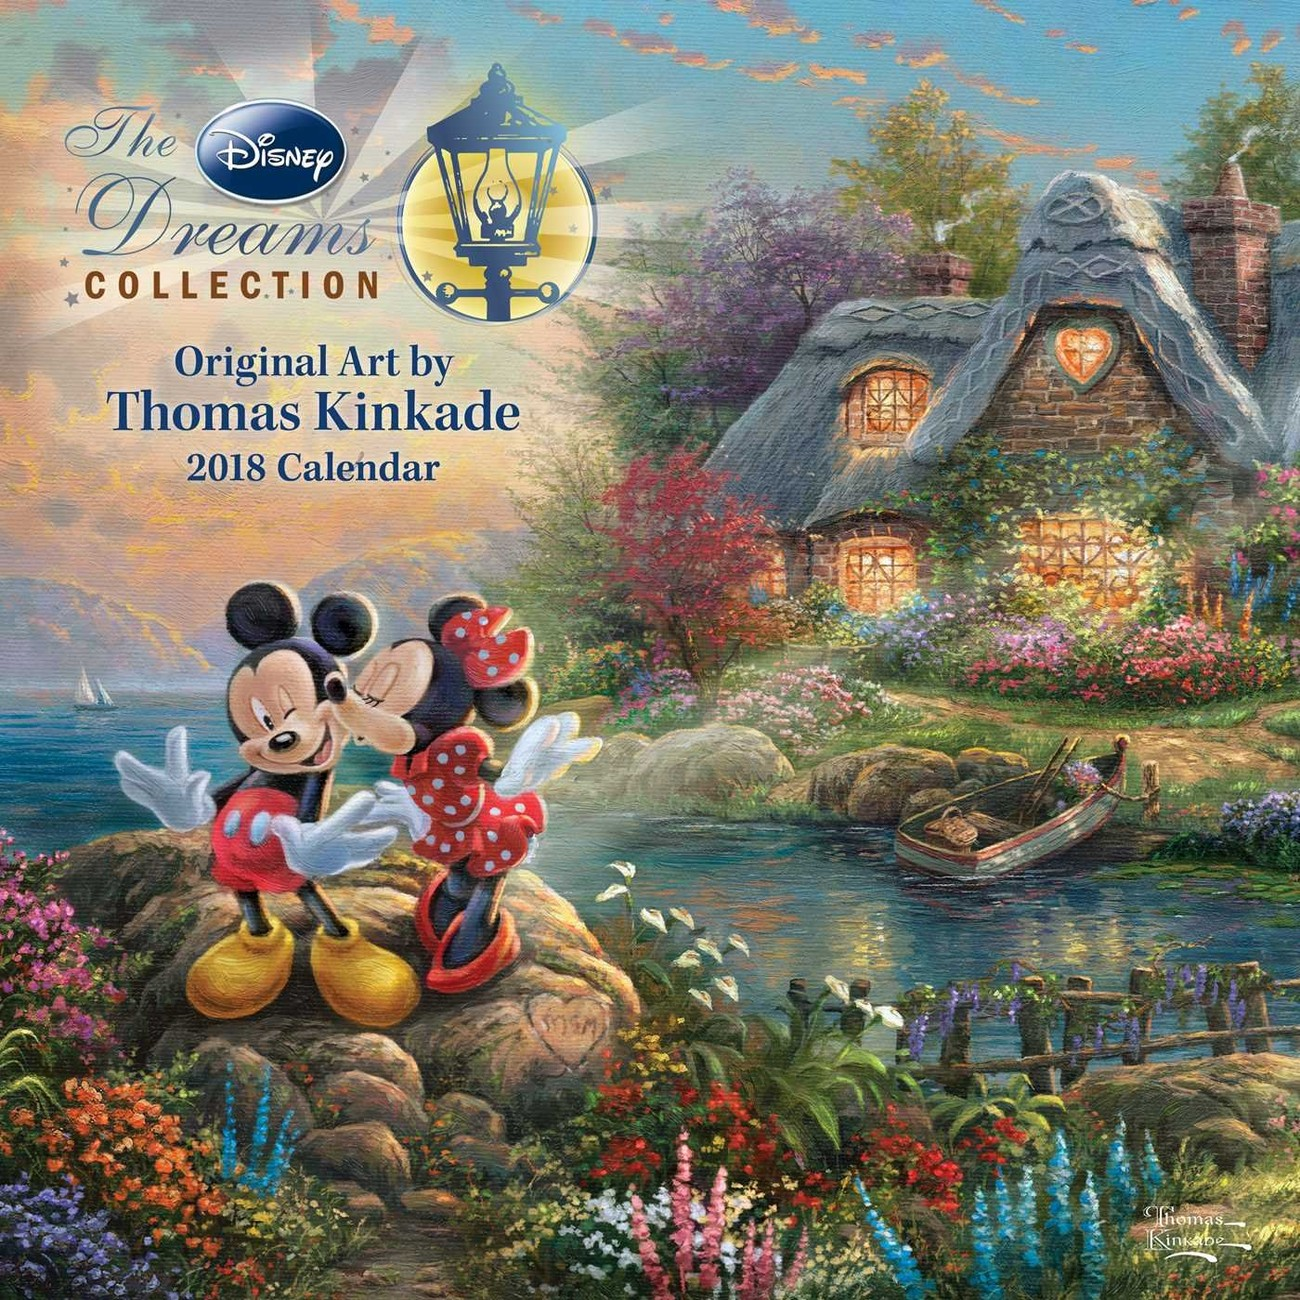 thomas kinkade naptár 2019 Thomas Kinkade   The Disney Dreams Collection   Calendars 2019 on  thomas kinkade naptár 2019